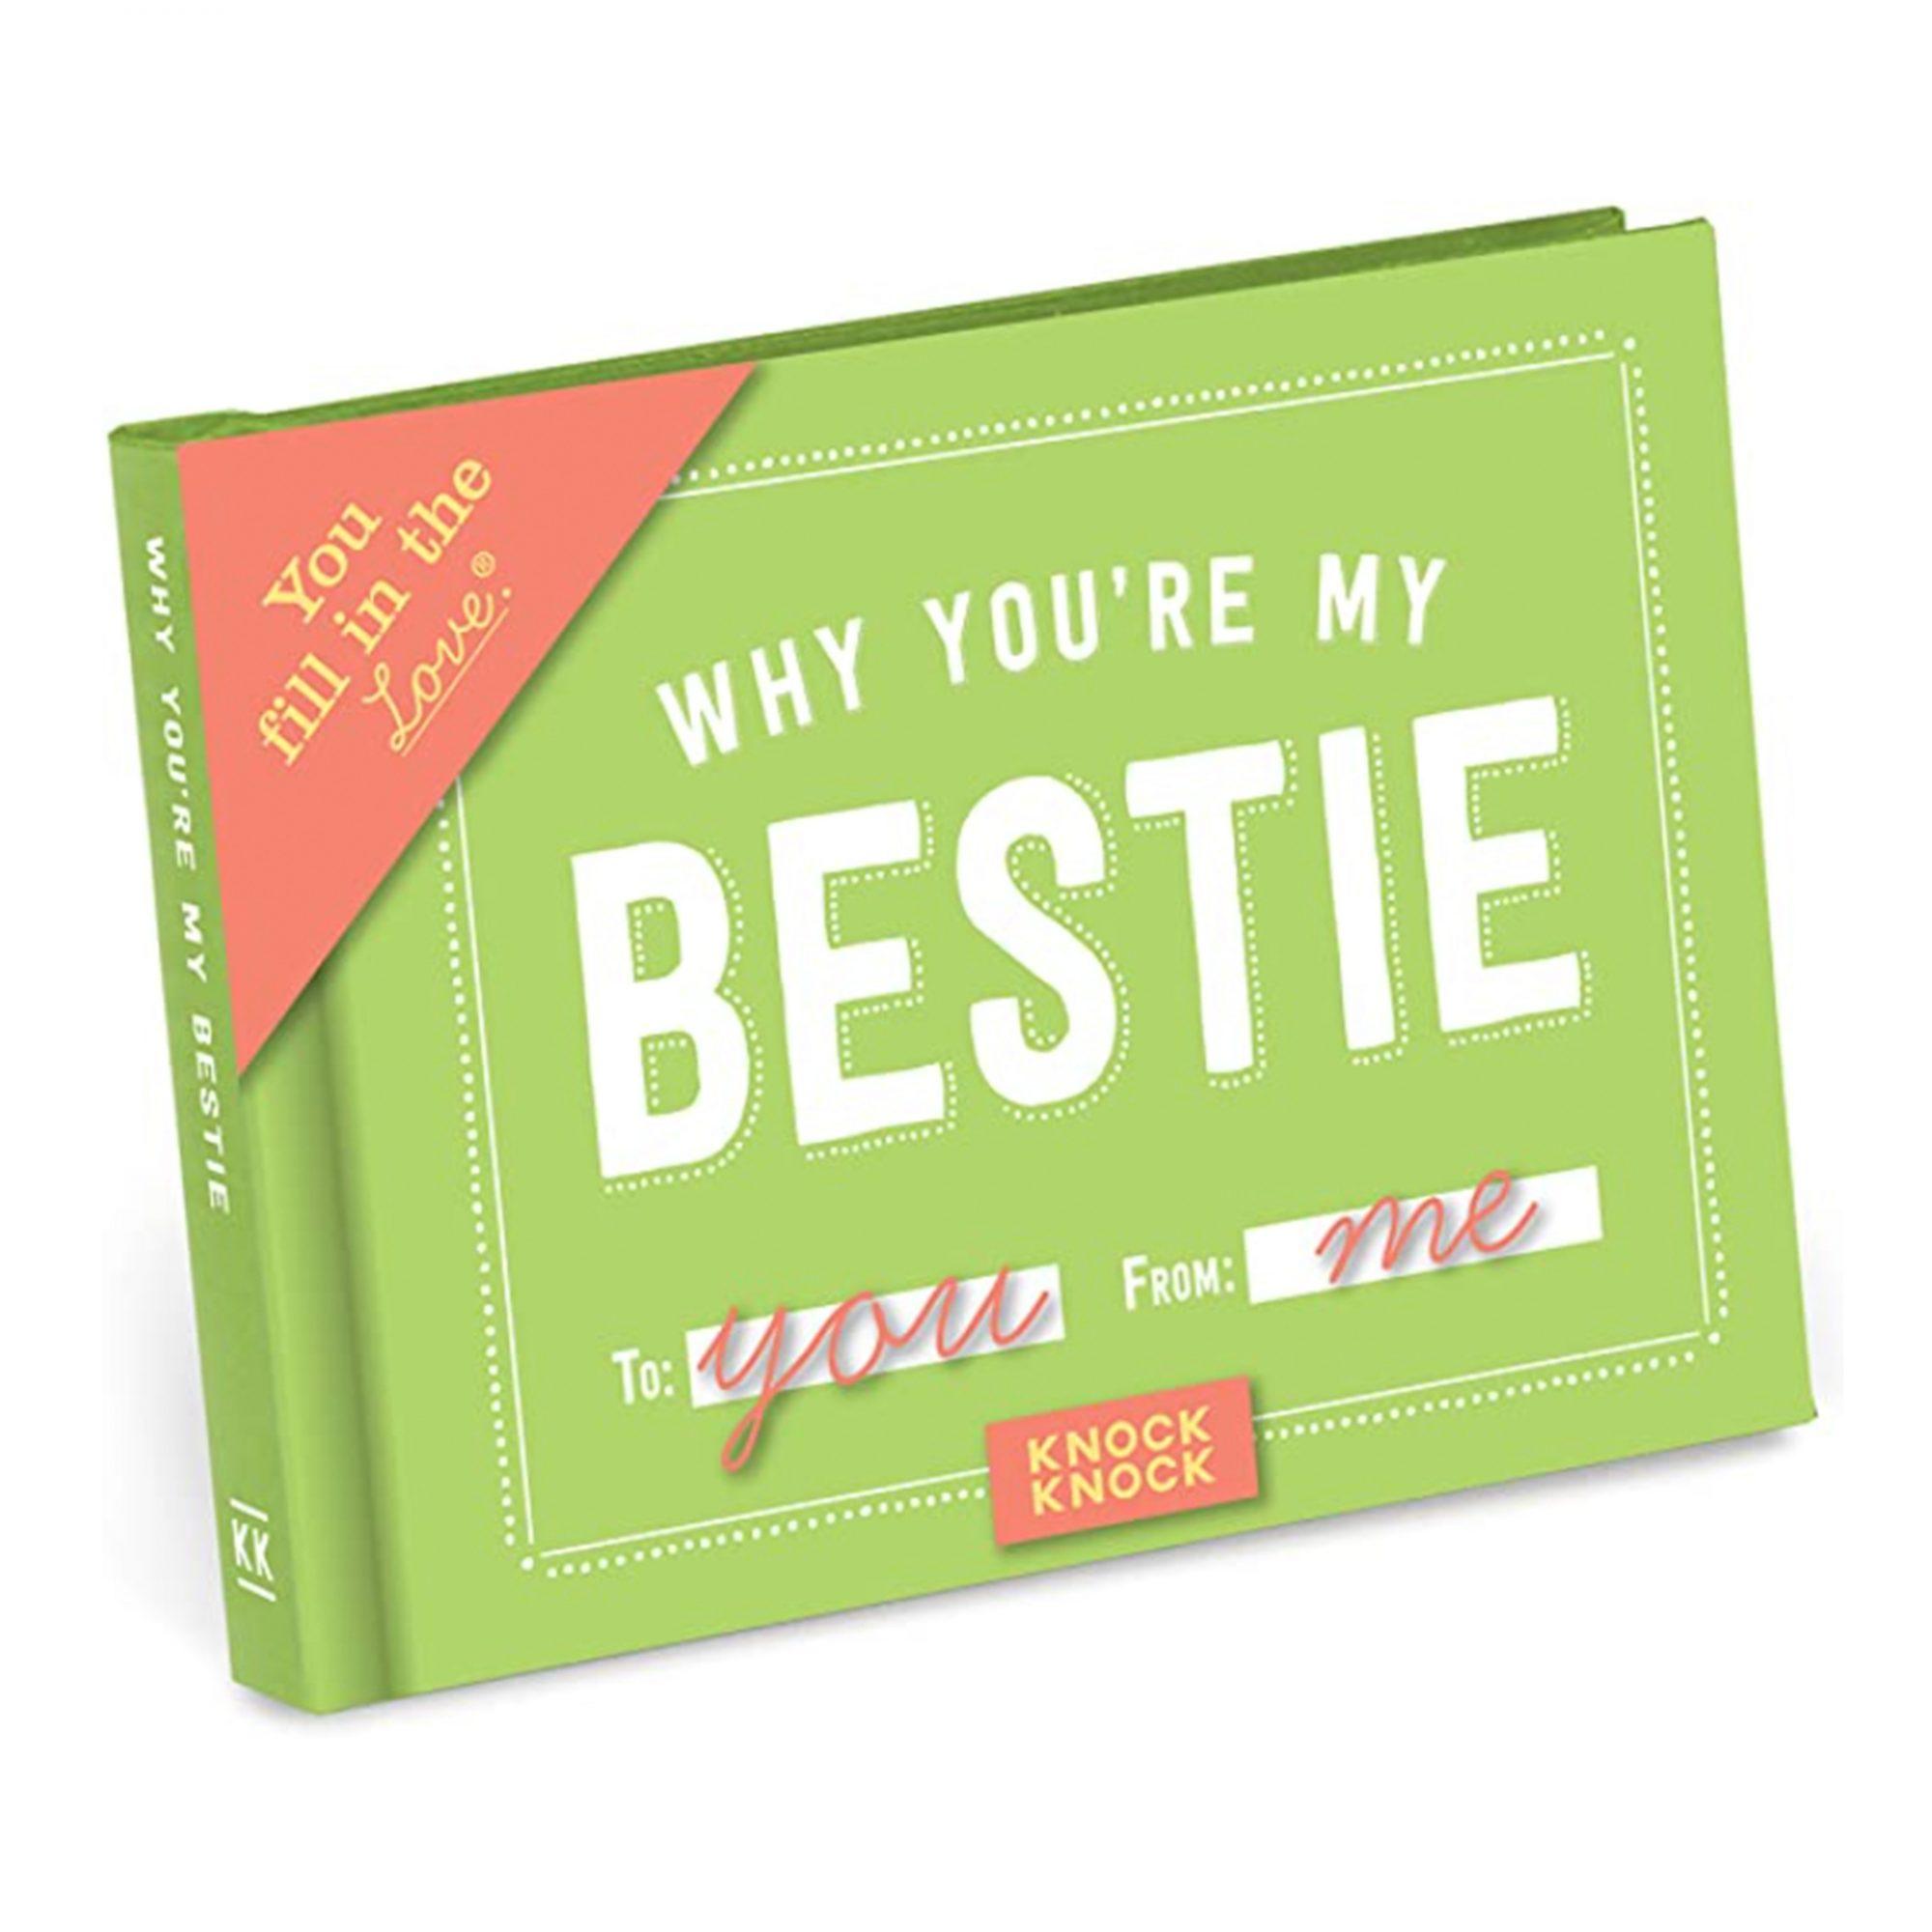 why-youre-my-bestie-book, best-friend-gift-ideas